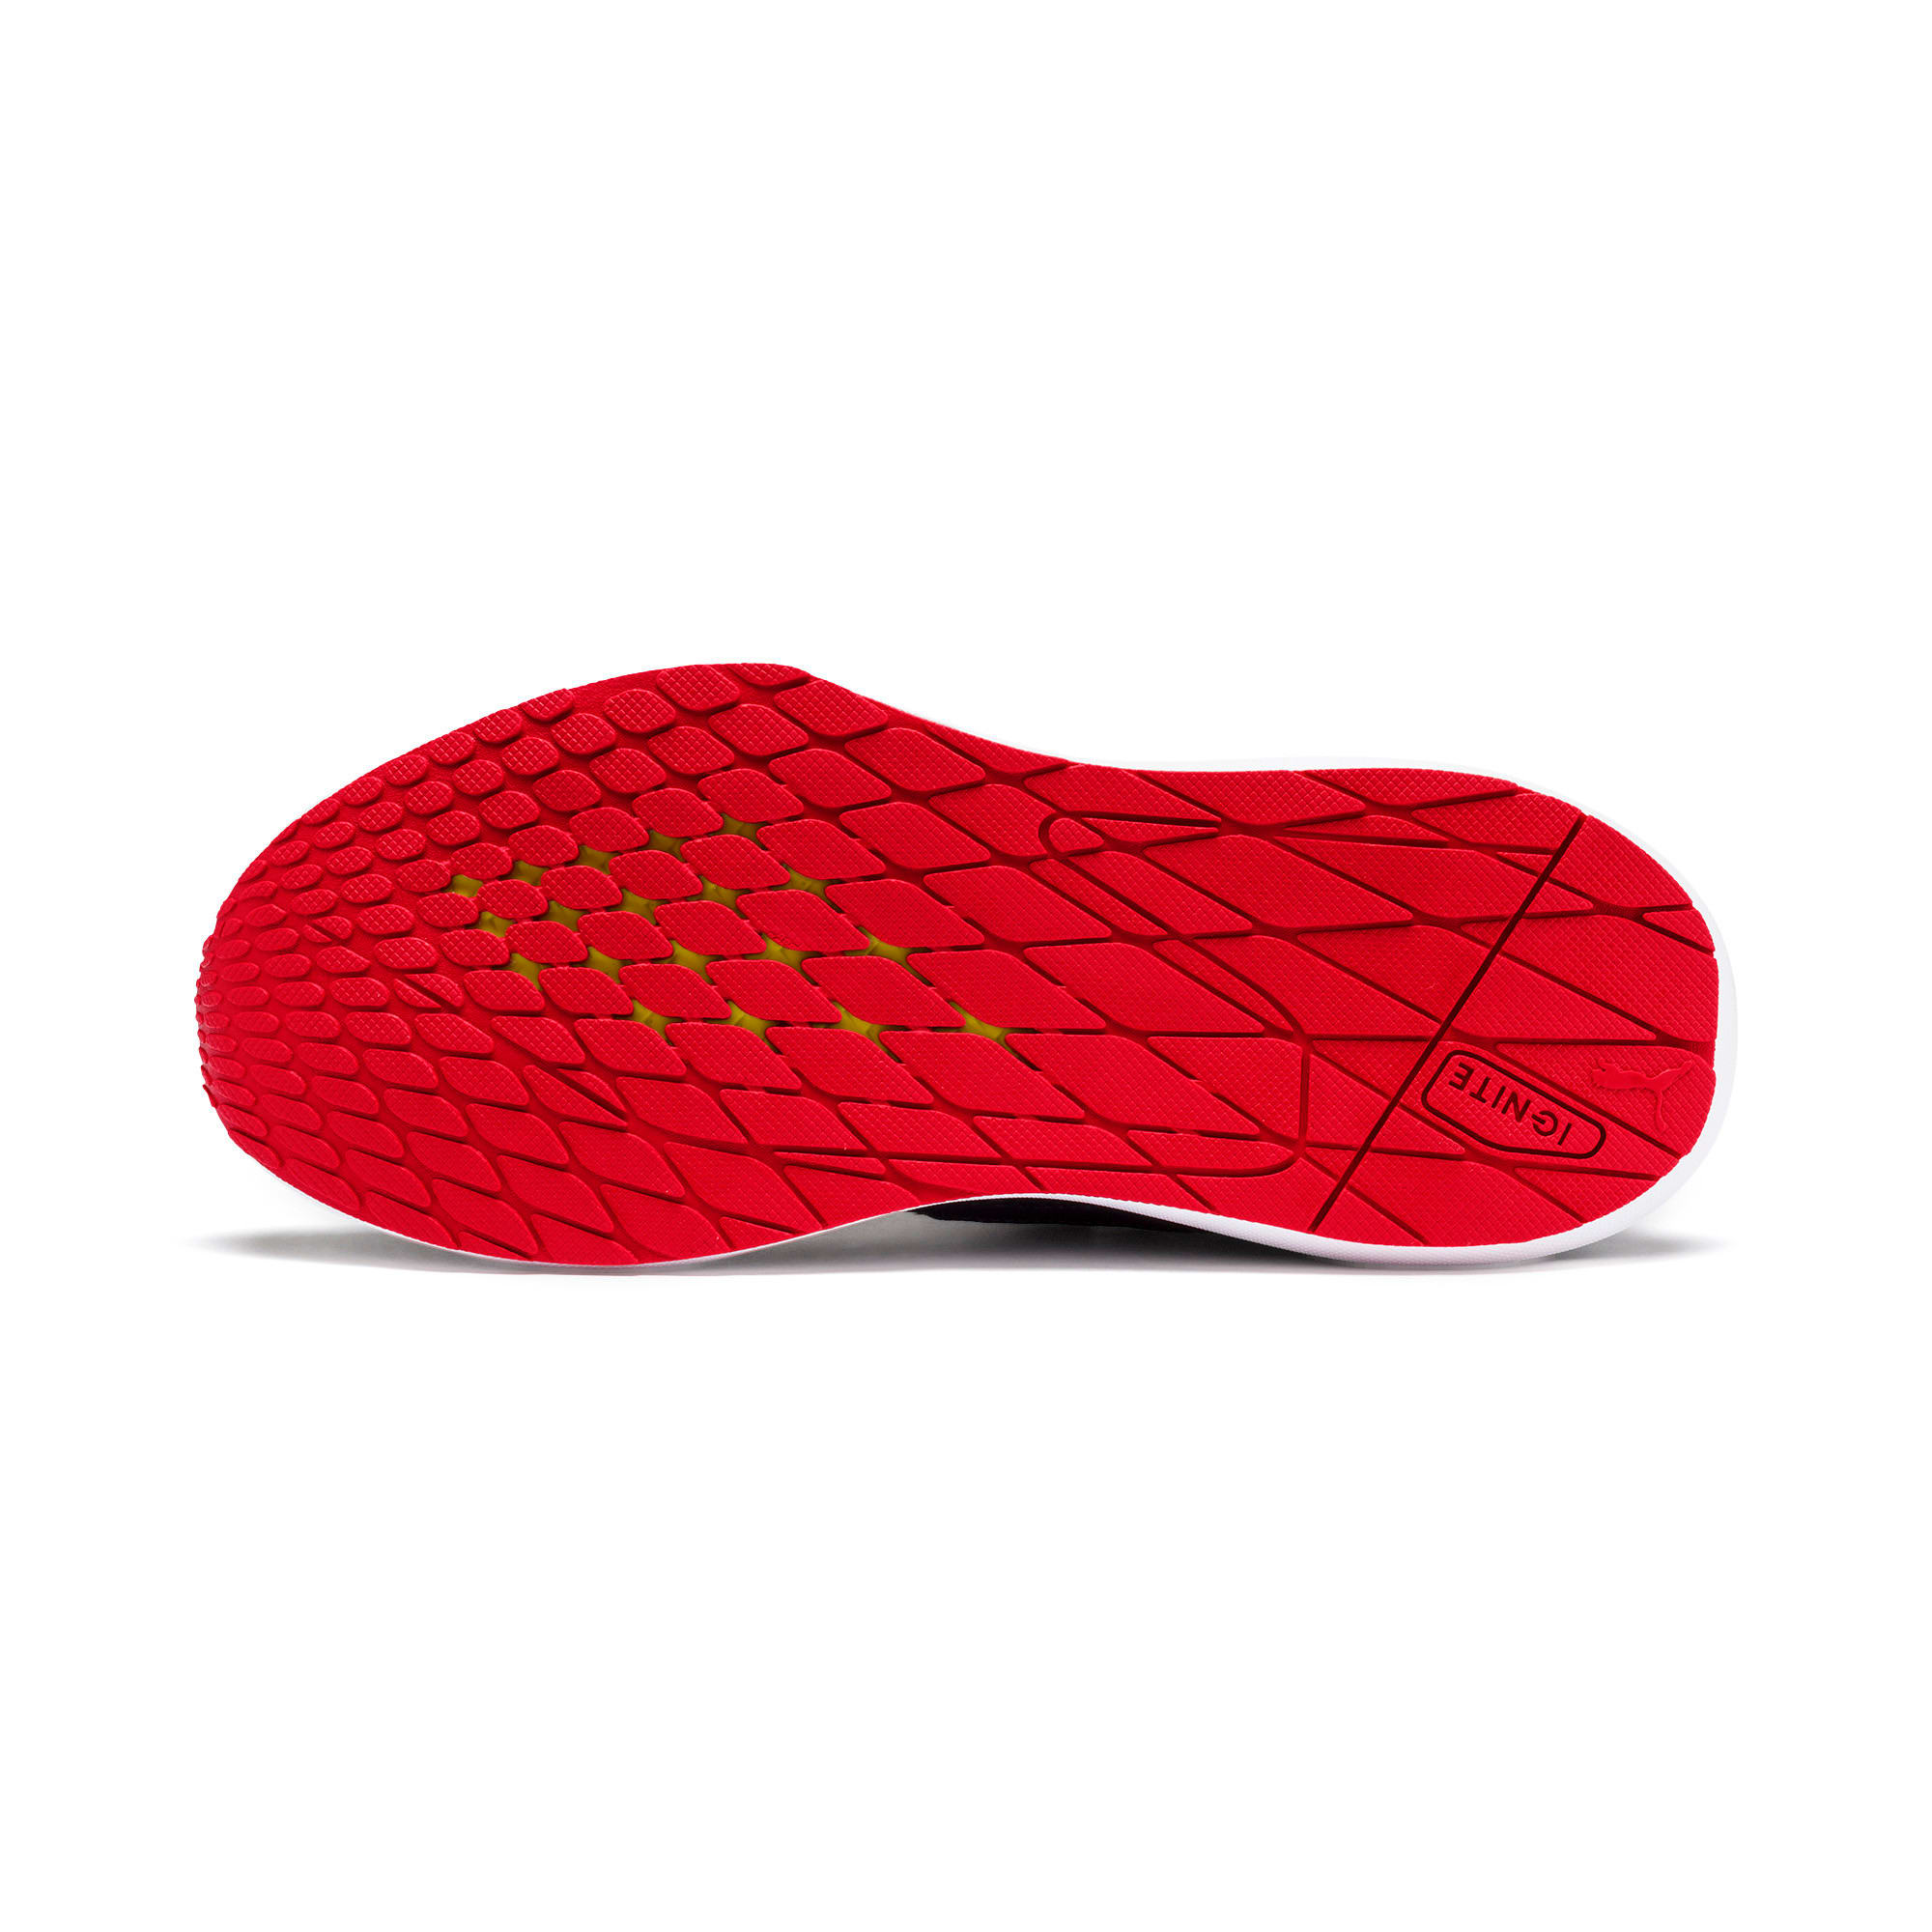 Thumbnail 5 of Red Bull Racing Evo Cat II Graphic Men's Training Shoes, NIGHT SKY-White-Chinese Red, medium